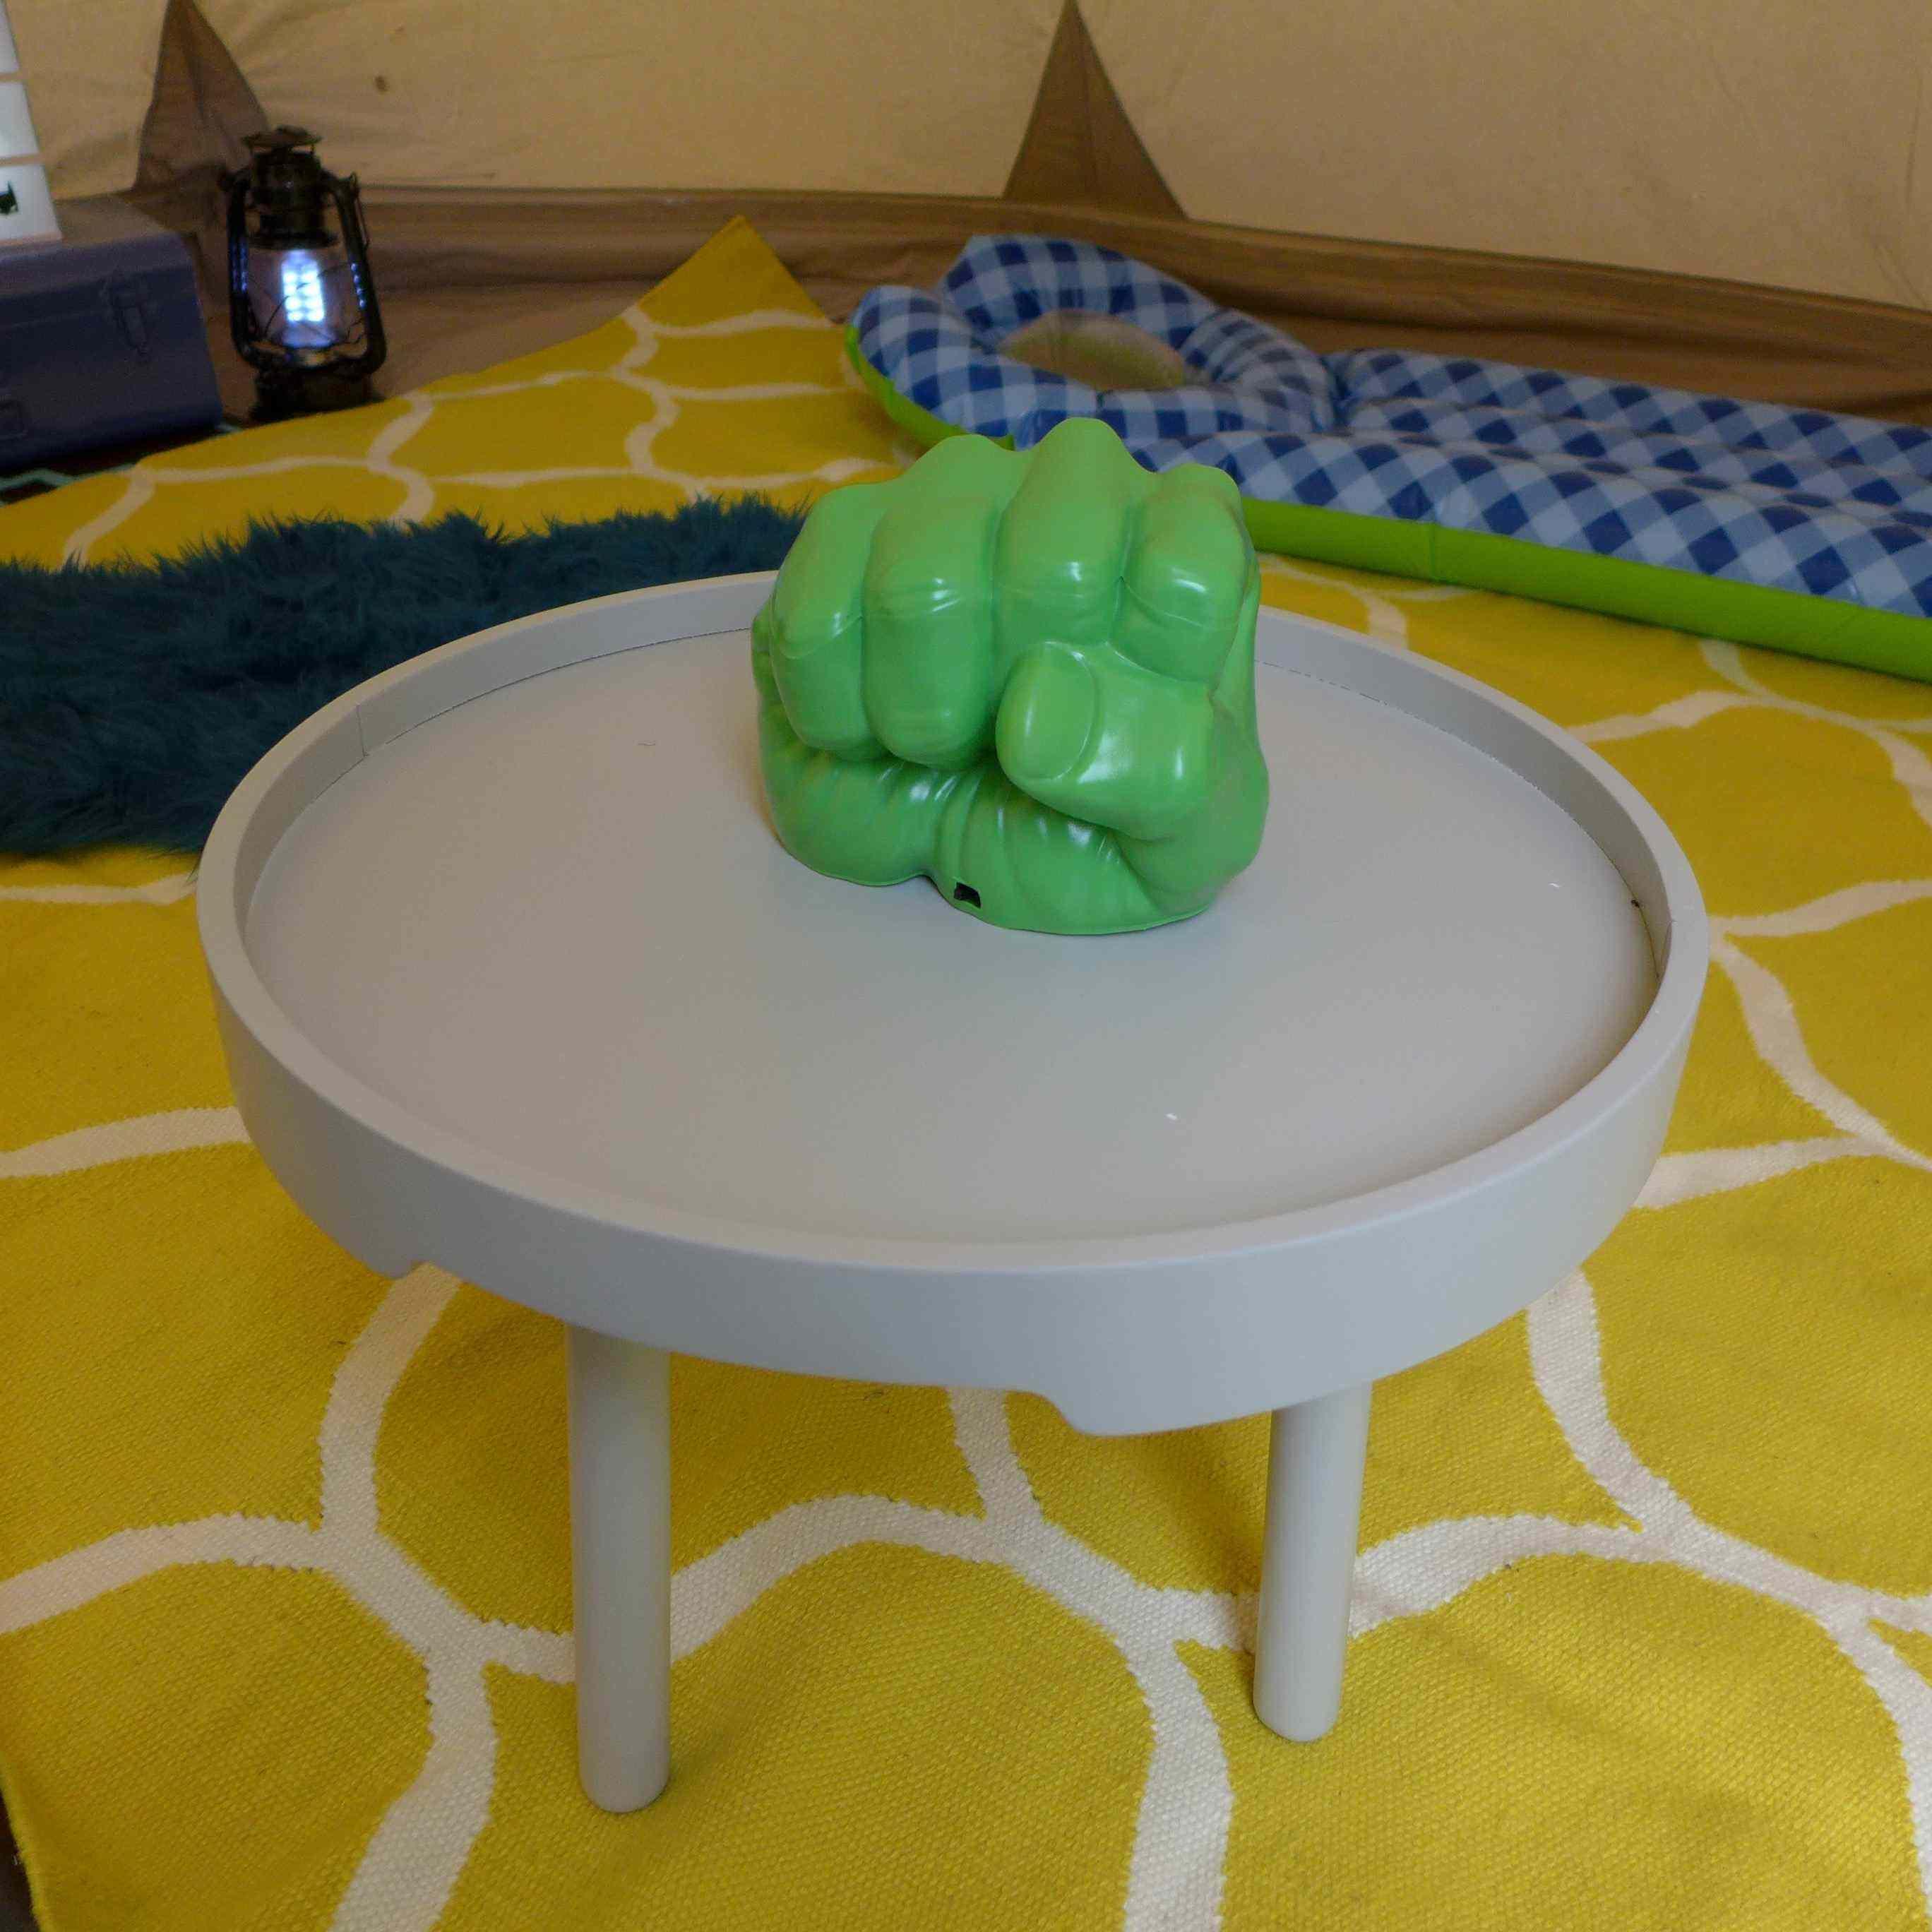 poing hulk et table basse grise